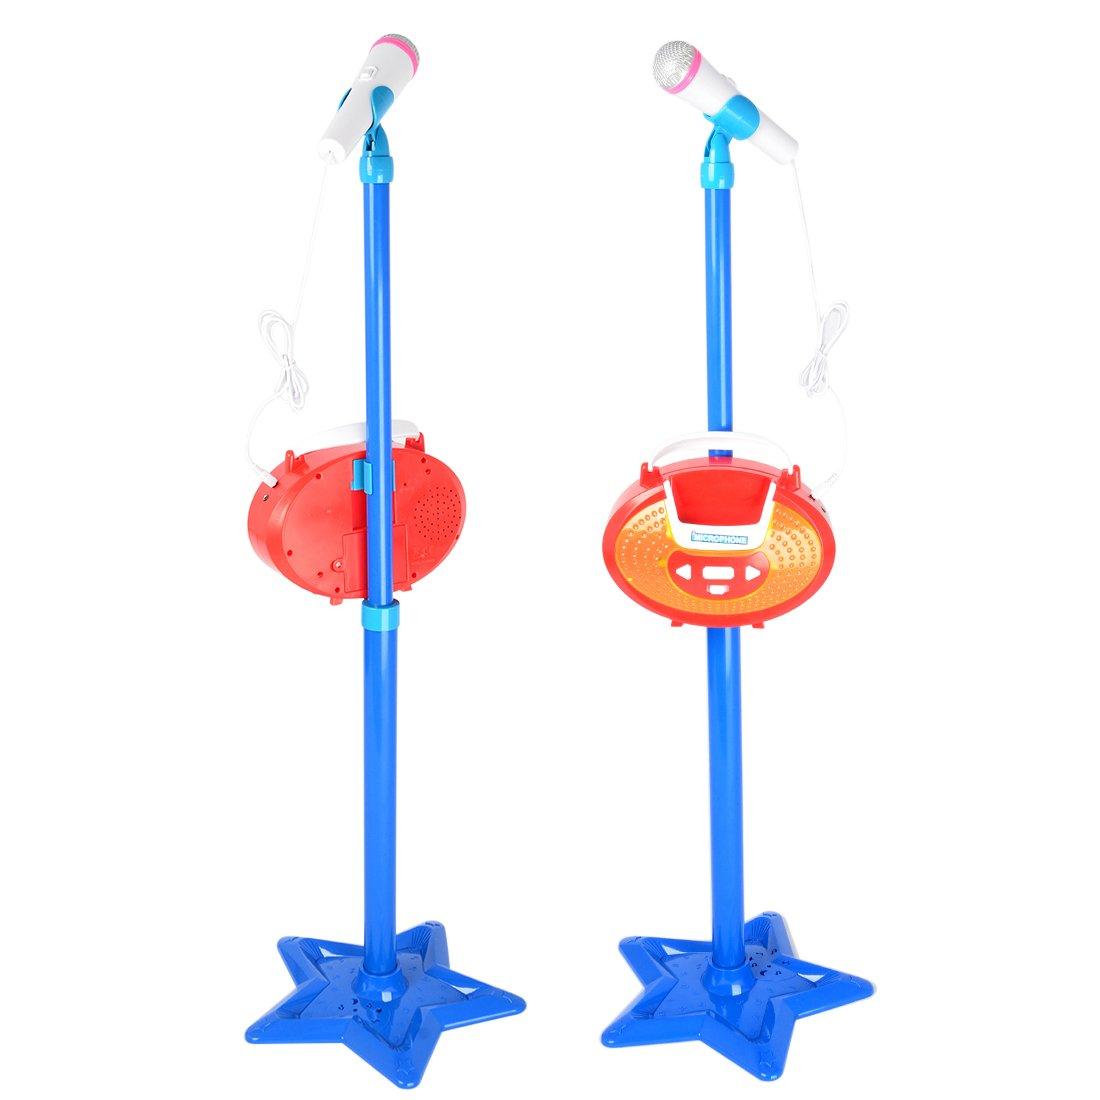 LoKauf Microphone and Stand Kids Karaoke Machine Childrens Microphone with Stand Toy Microphone